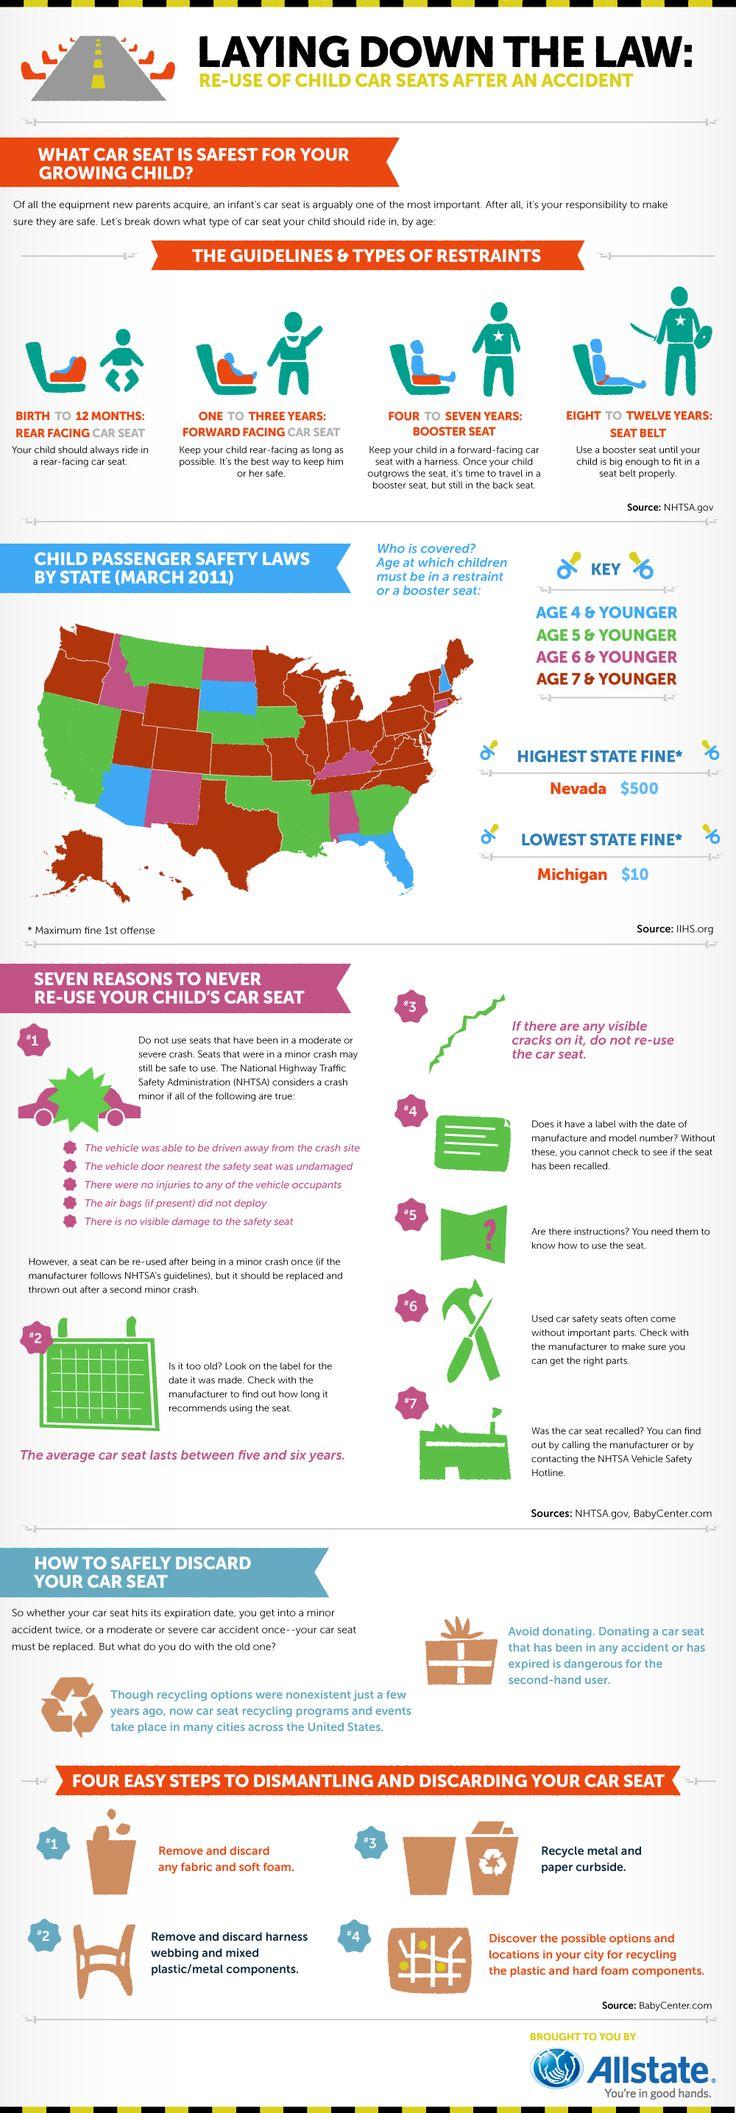 Florida car seat laws - Car Seat 101 Keeping Kids Safe Infographic